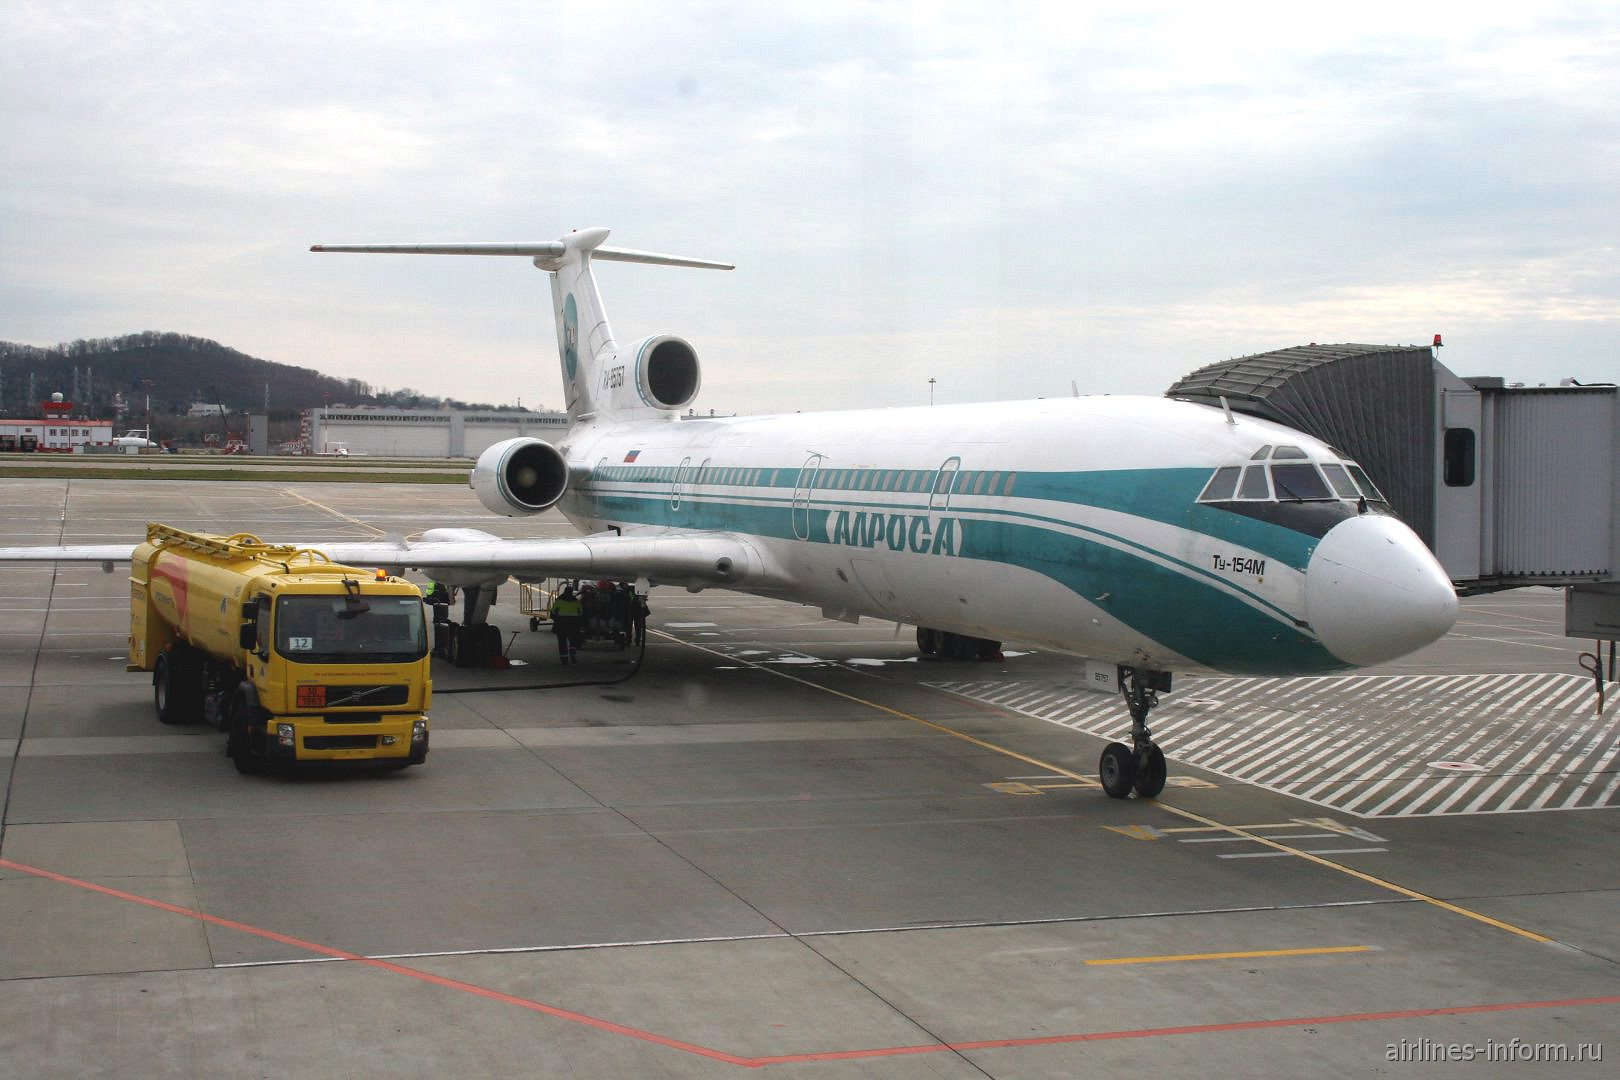 Самолет Ту-154 RA-85757 авиакомпании